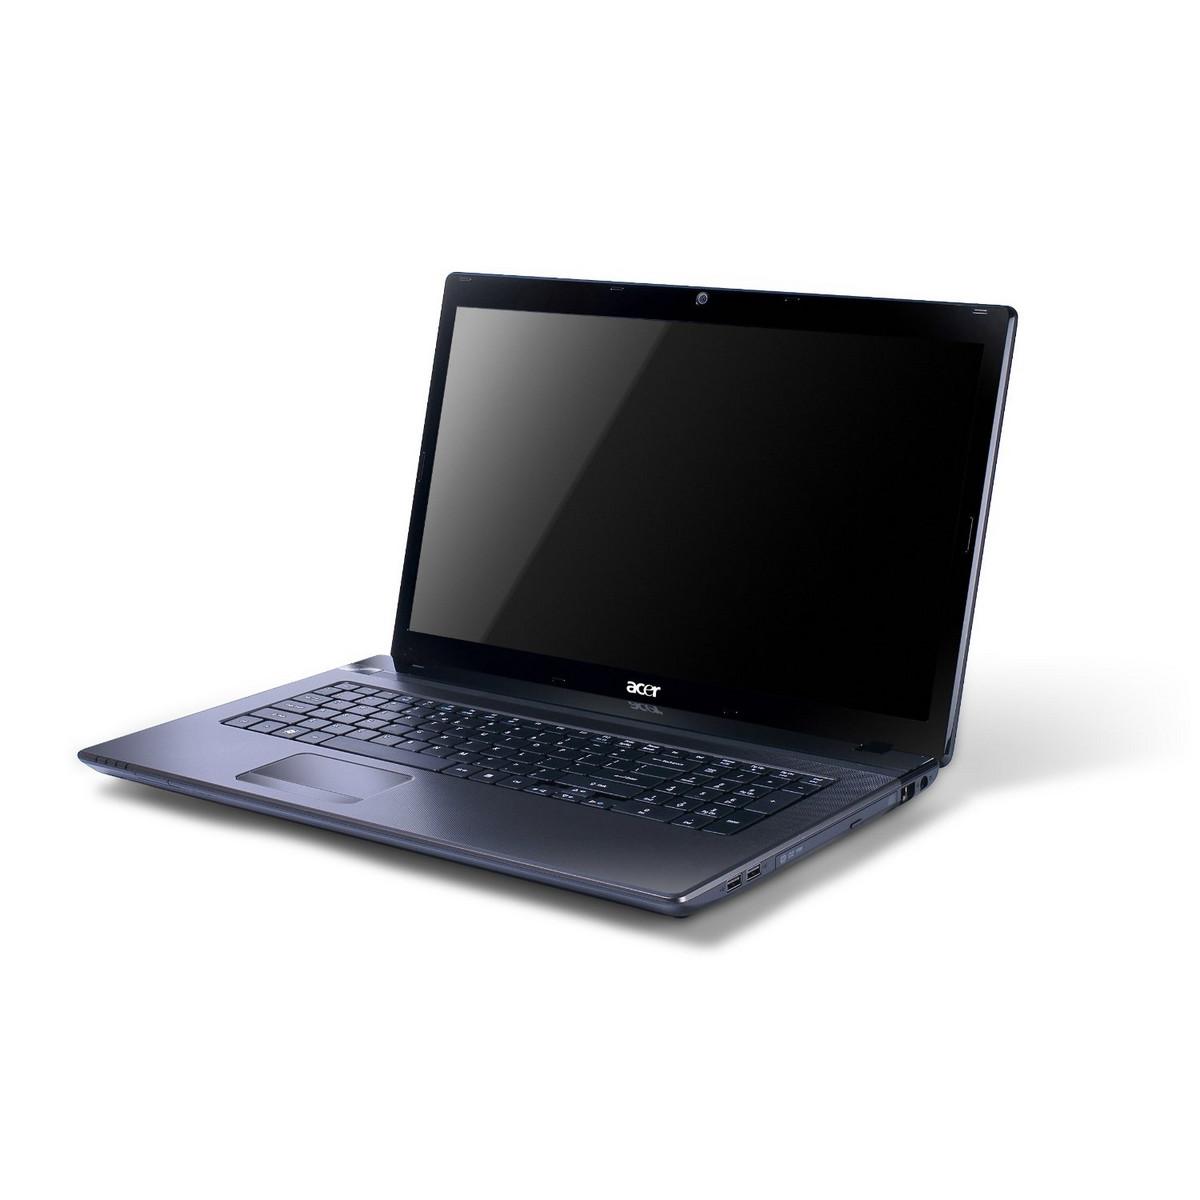 Acer Aspire 7750 AMD Graphics 64Bit